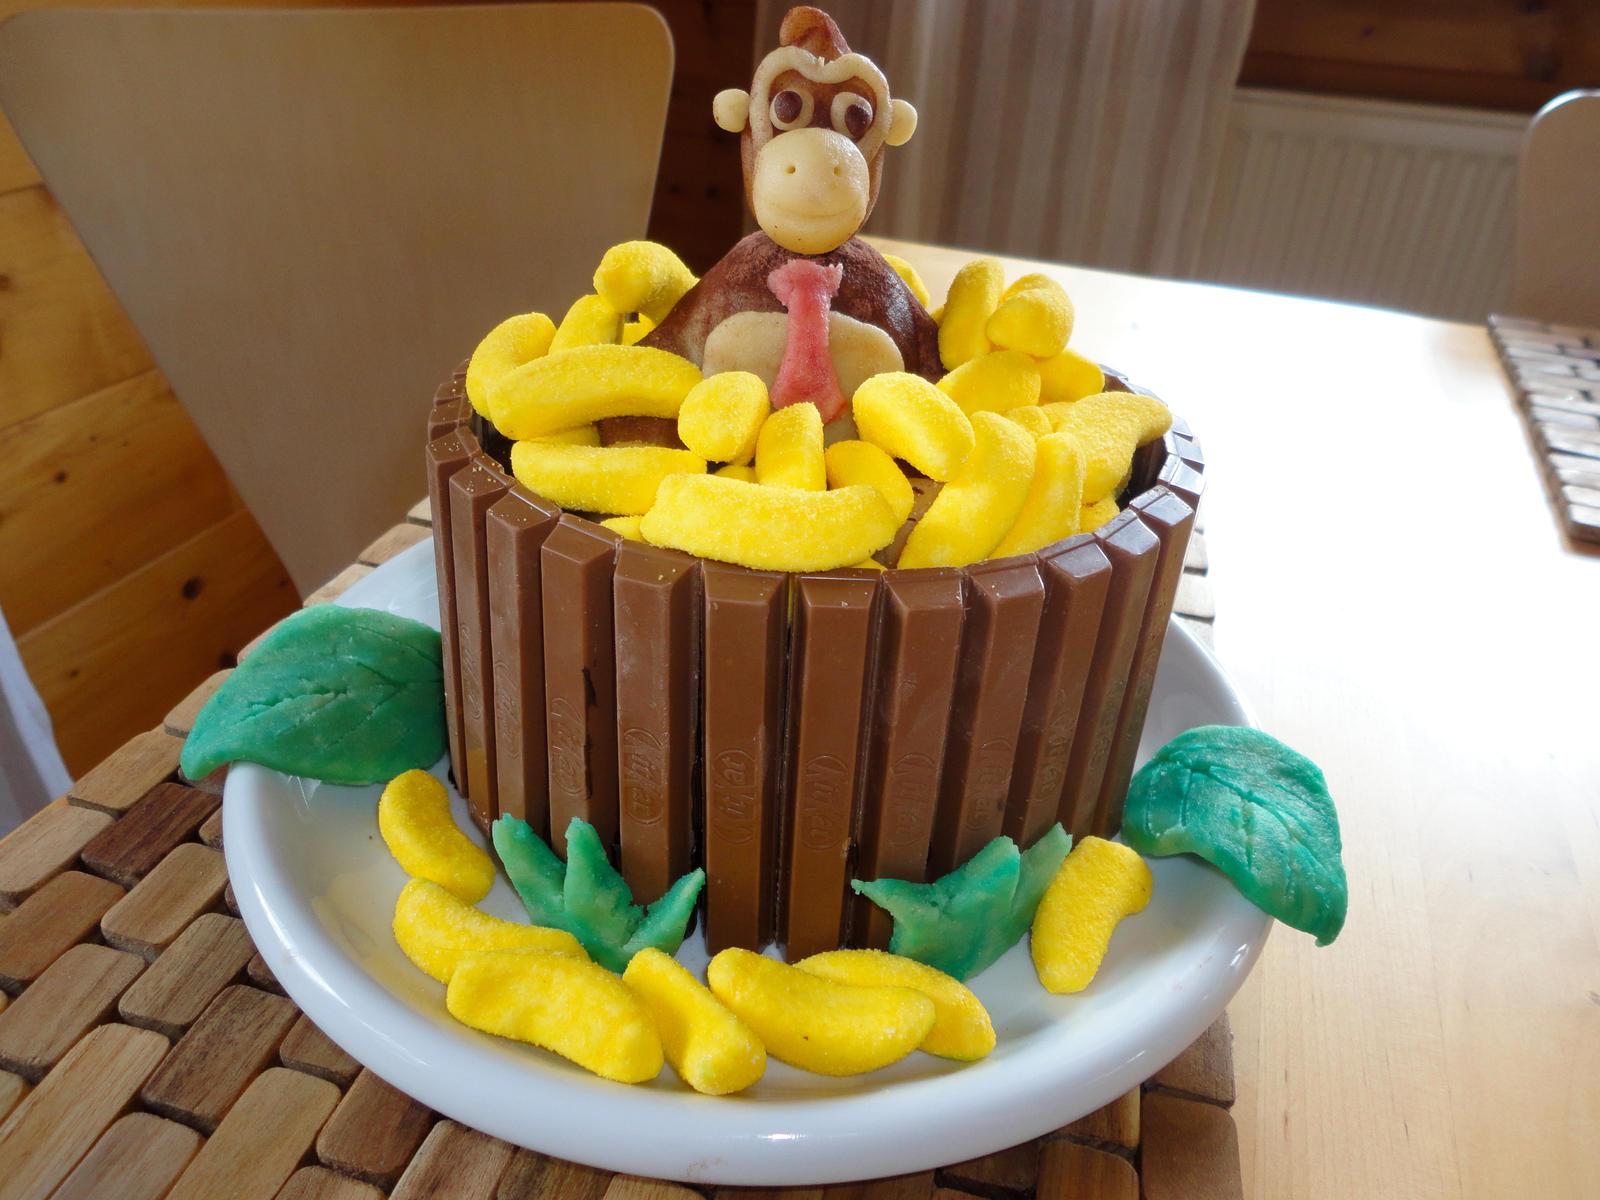 How To Make Donkey Kong Banana Cake